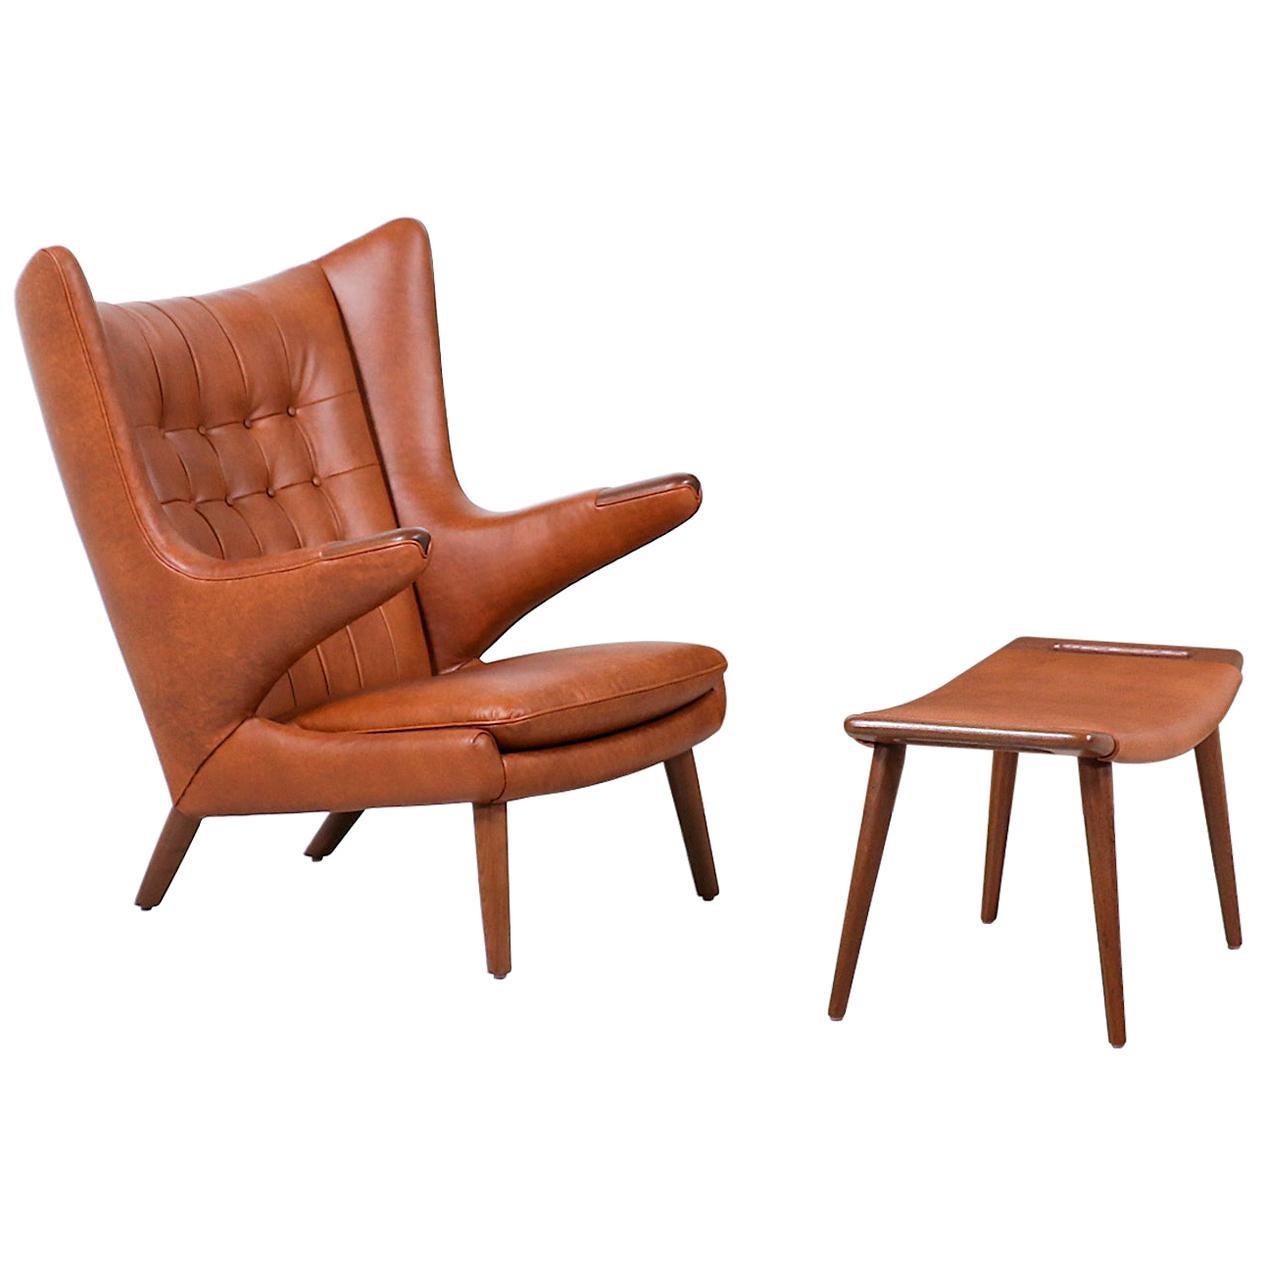 "Hans J. Wegner Cognac Leather ""Papa Bear"" Chair with Ottoman for A.P. Stolen"